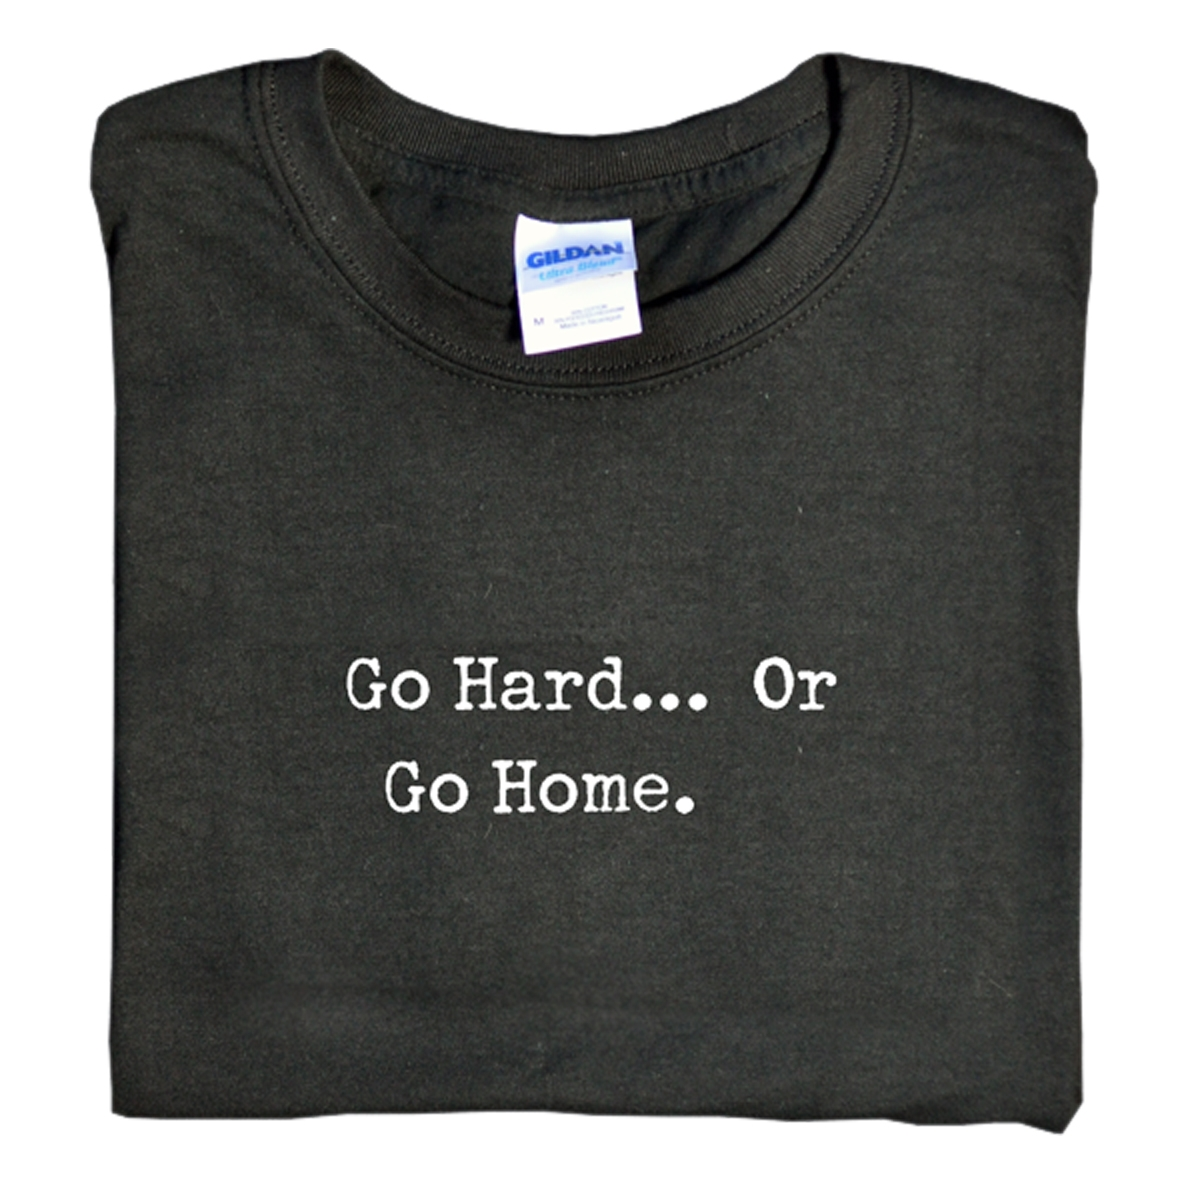 Black Go Hard Or Go Home T-Shirt Medium By Universal Nutrition